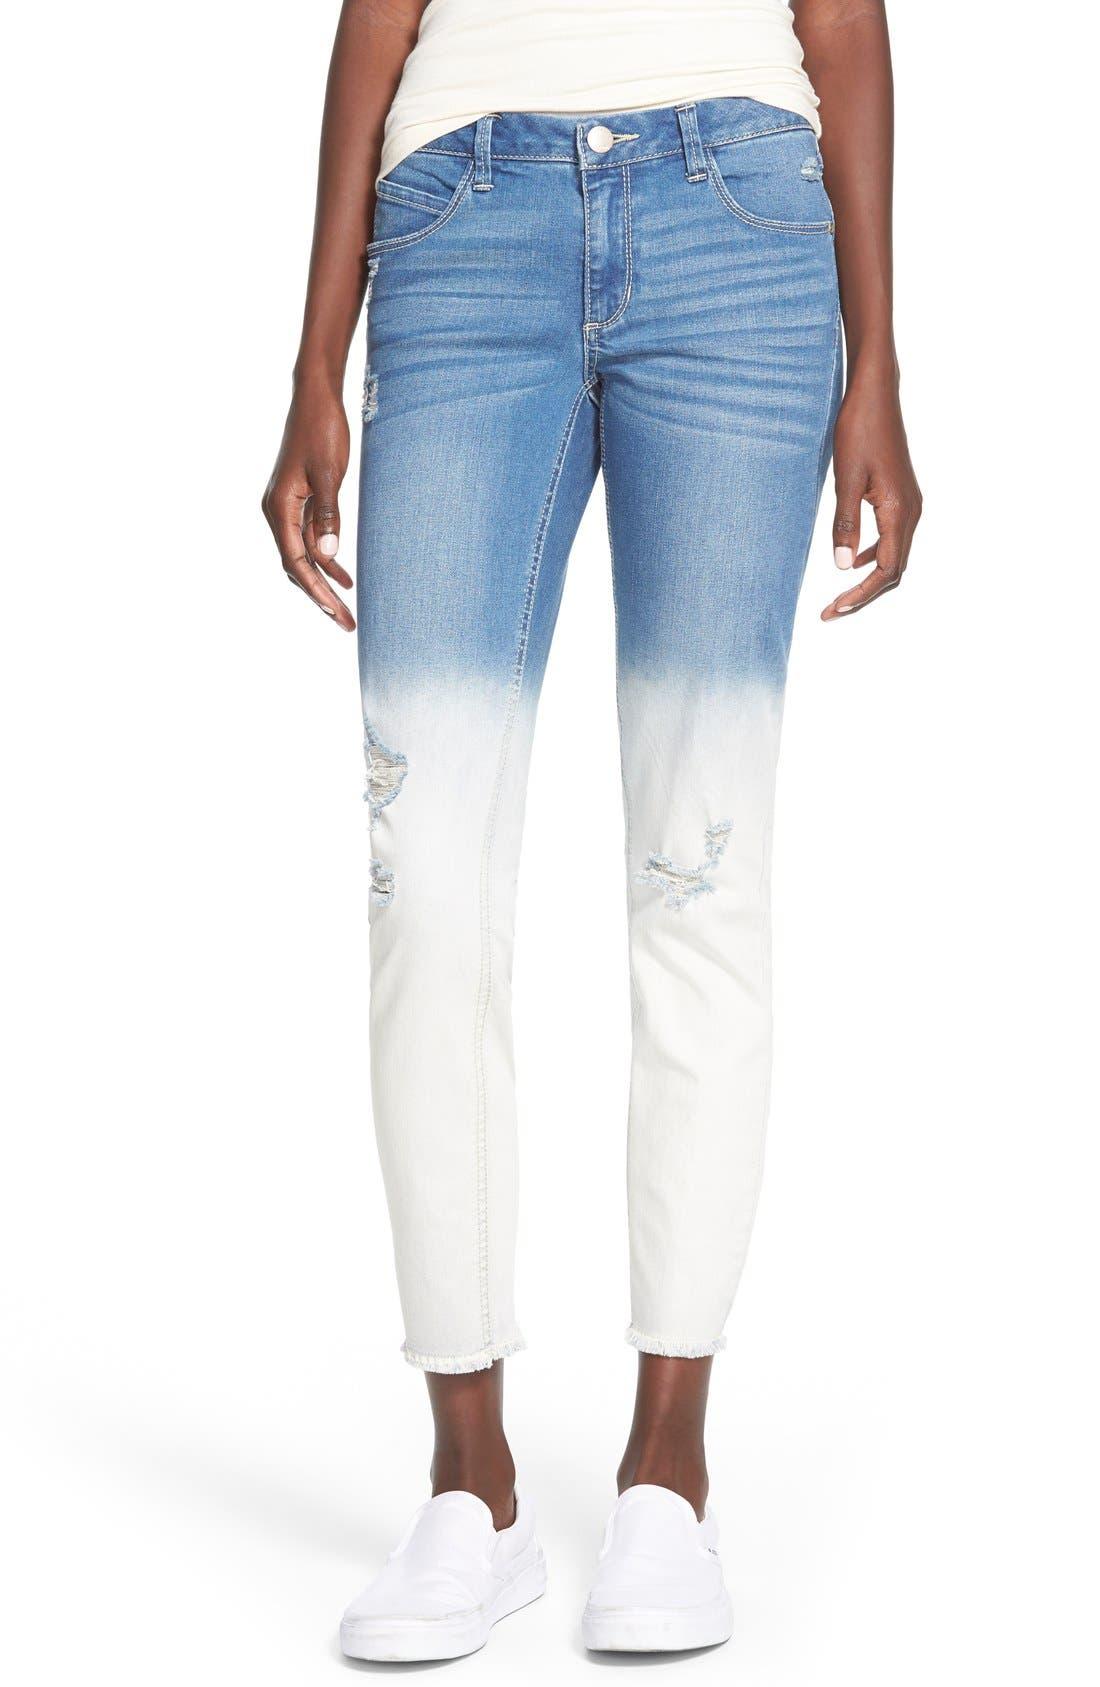 Main Image - Generra Dip Bleached Destroyed Skinny Jeans